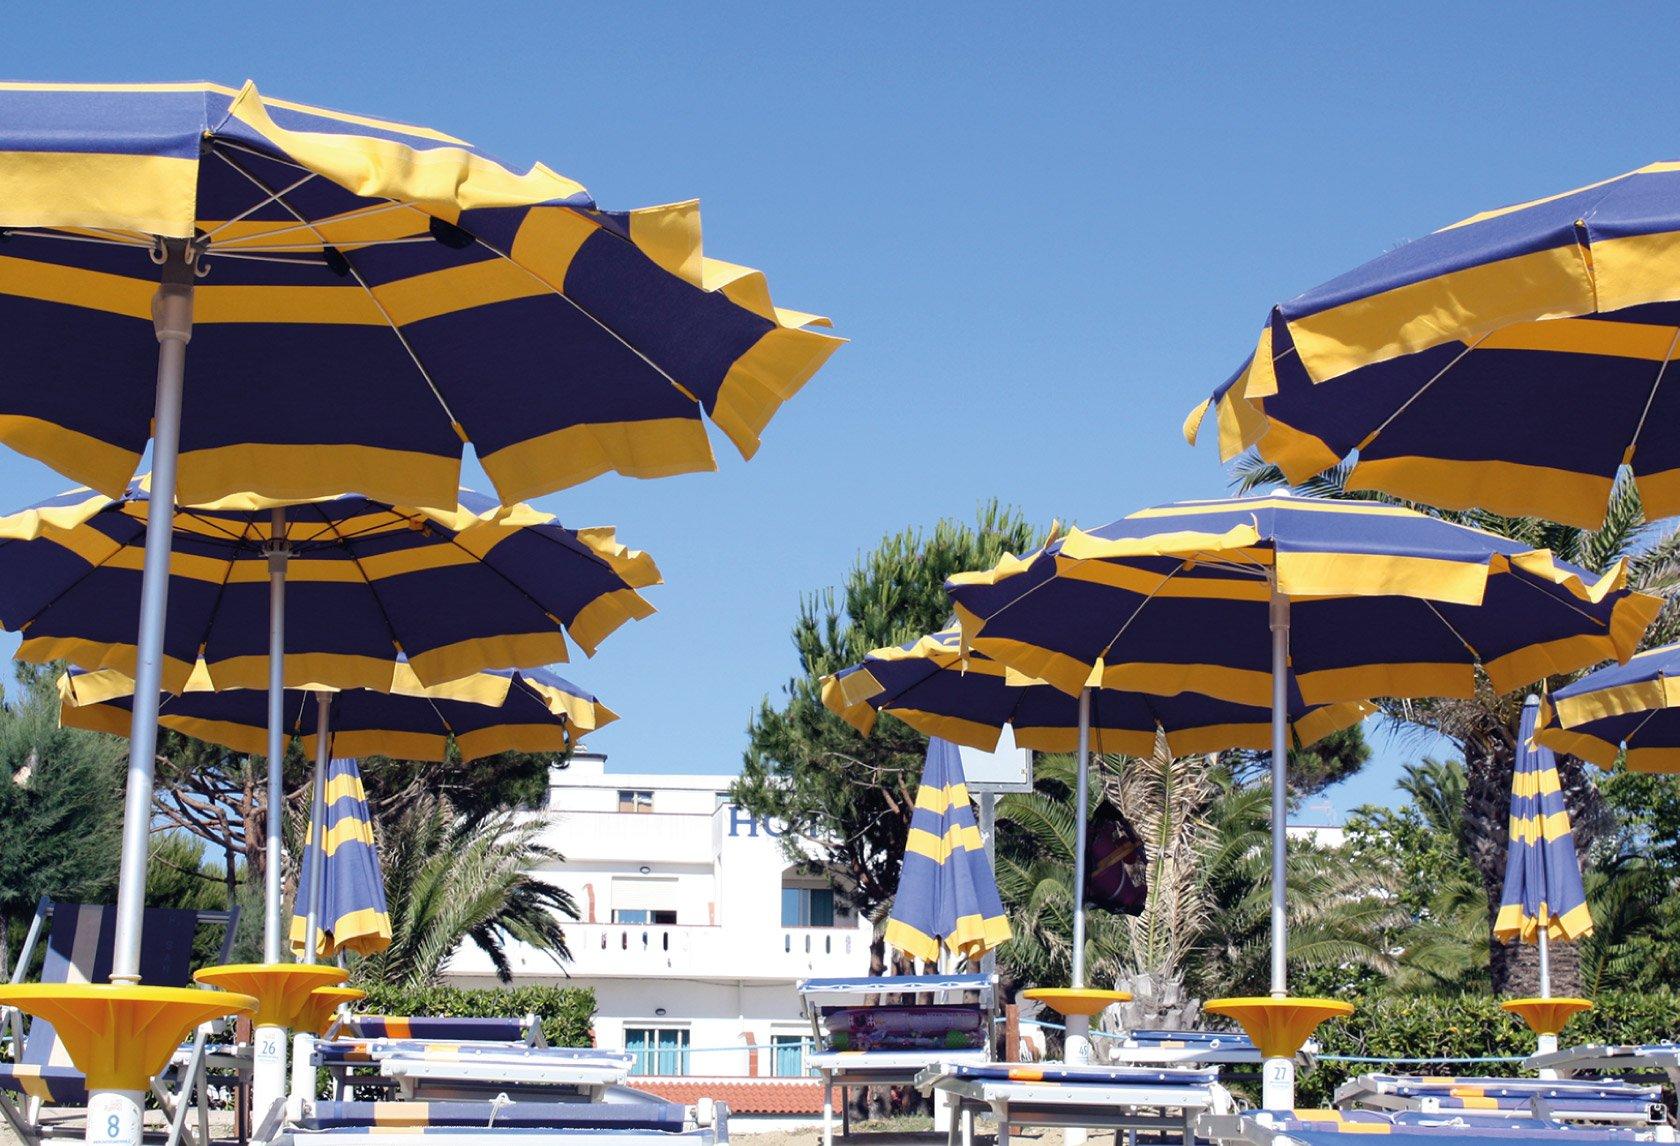 Hotel San Remo - Direkt an der Strandpromenade